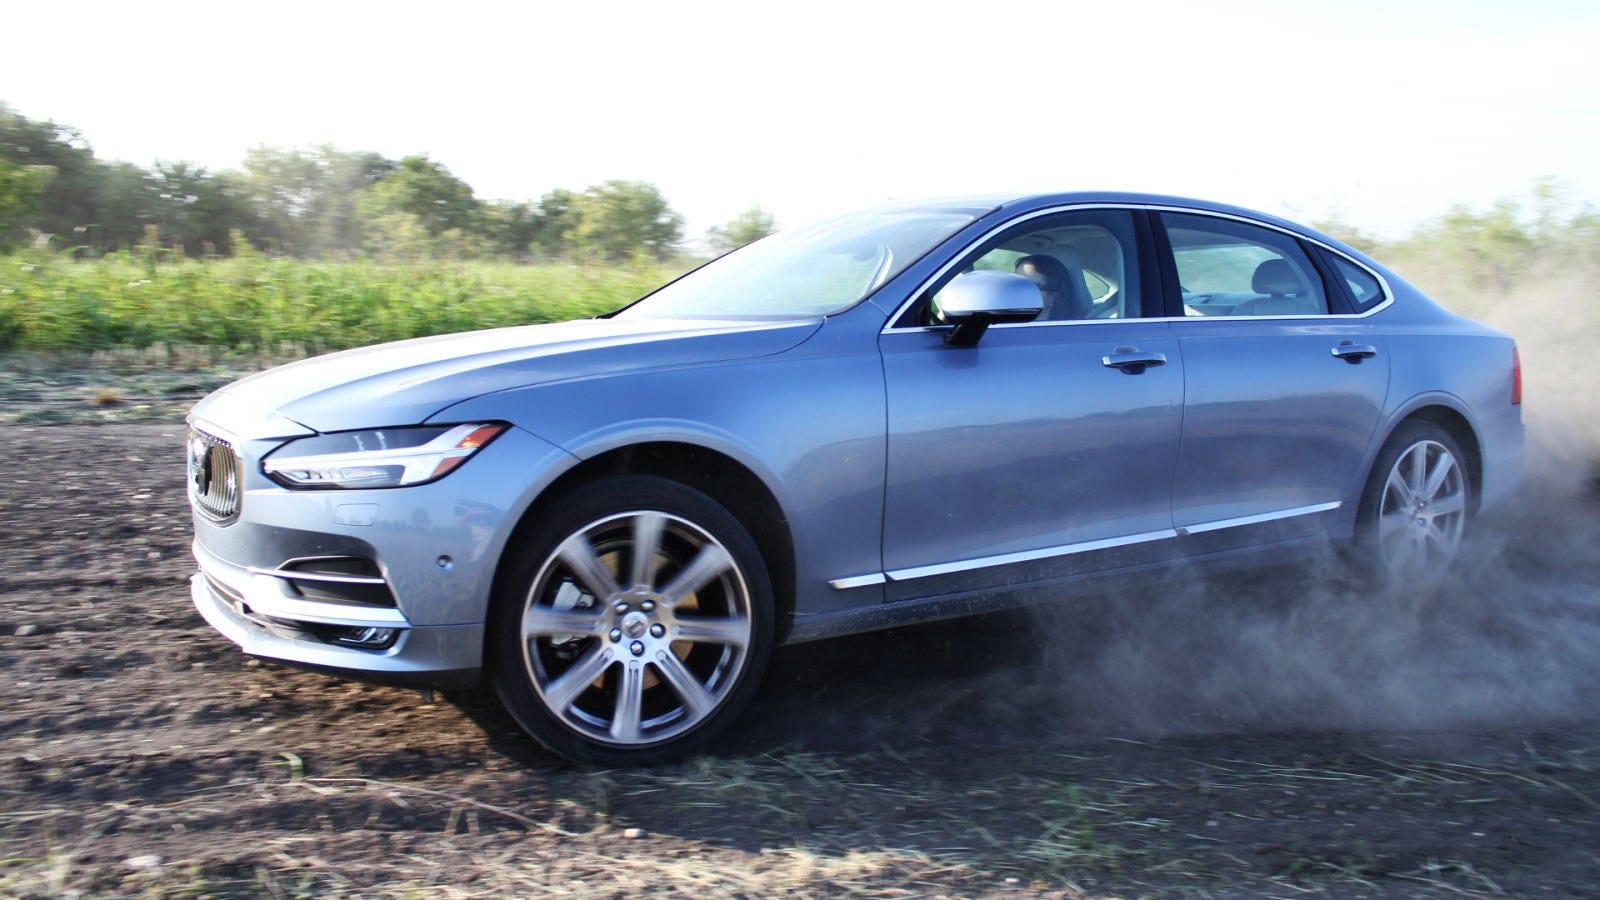 If Your Luxury Sedan Isn't As Nice As The Volvo S90, Send It Away